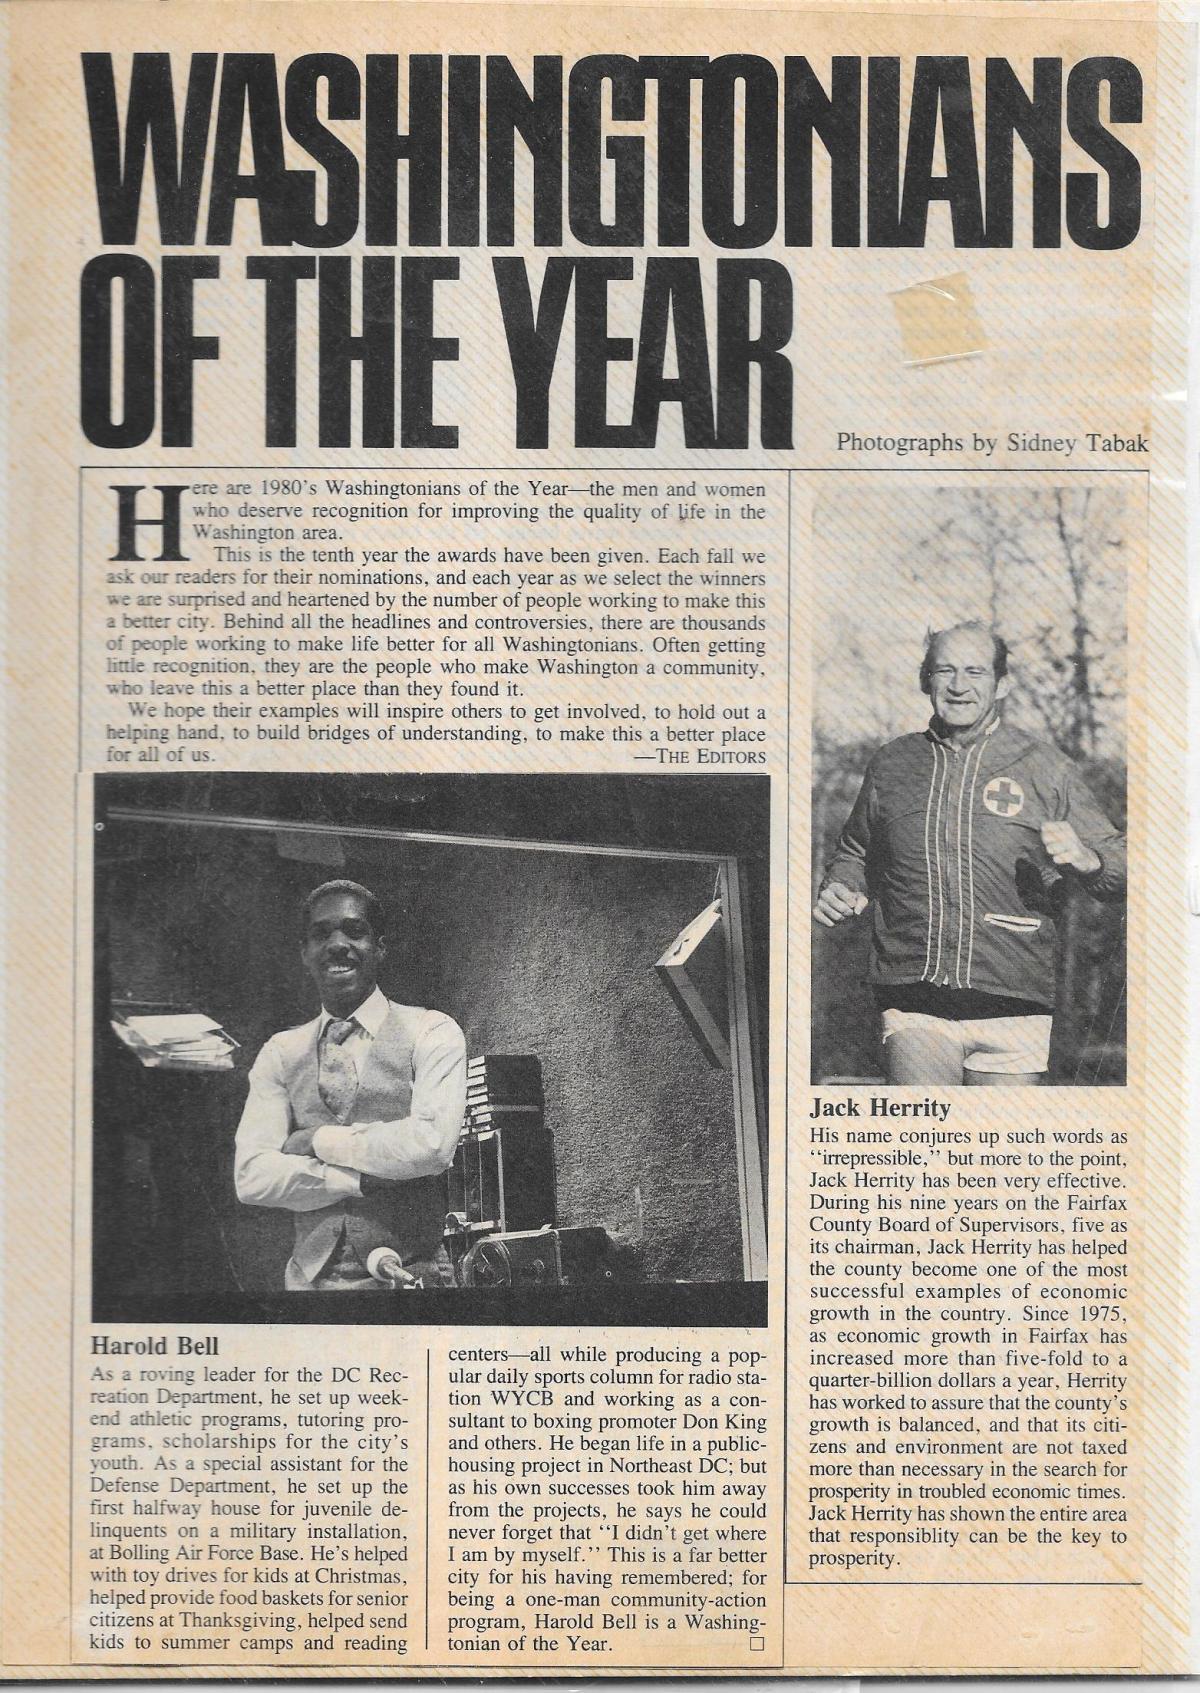 WASHINGTONIAN OF THE YEAR